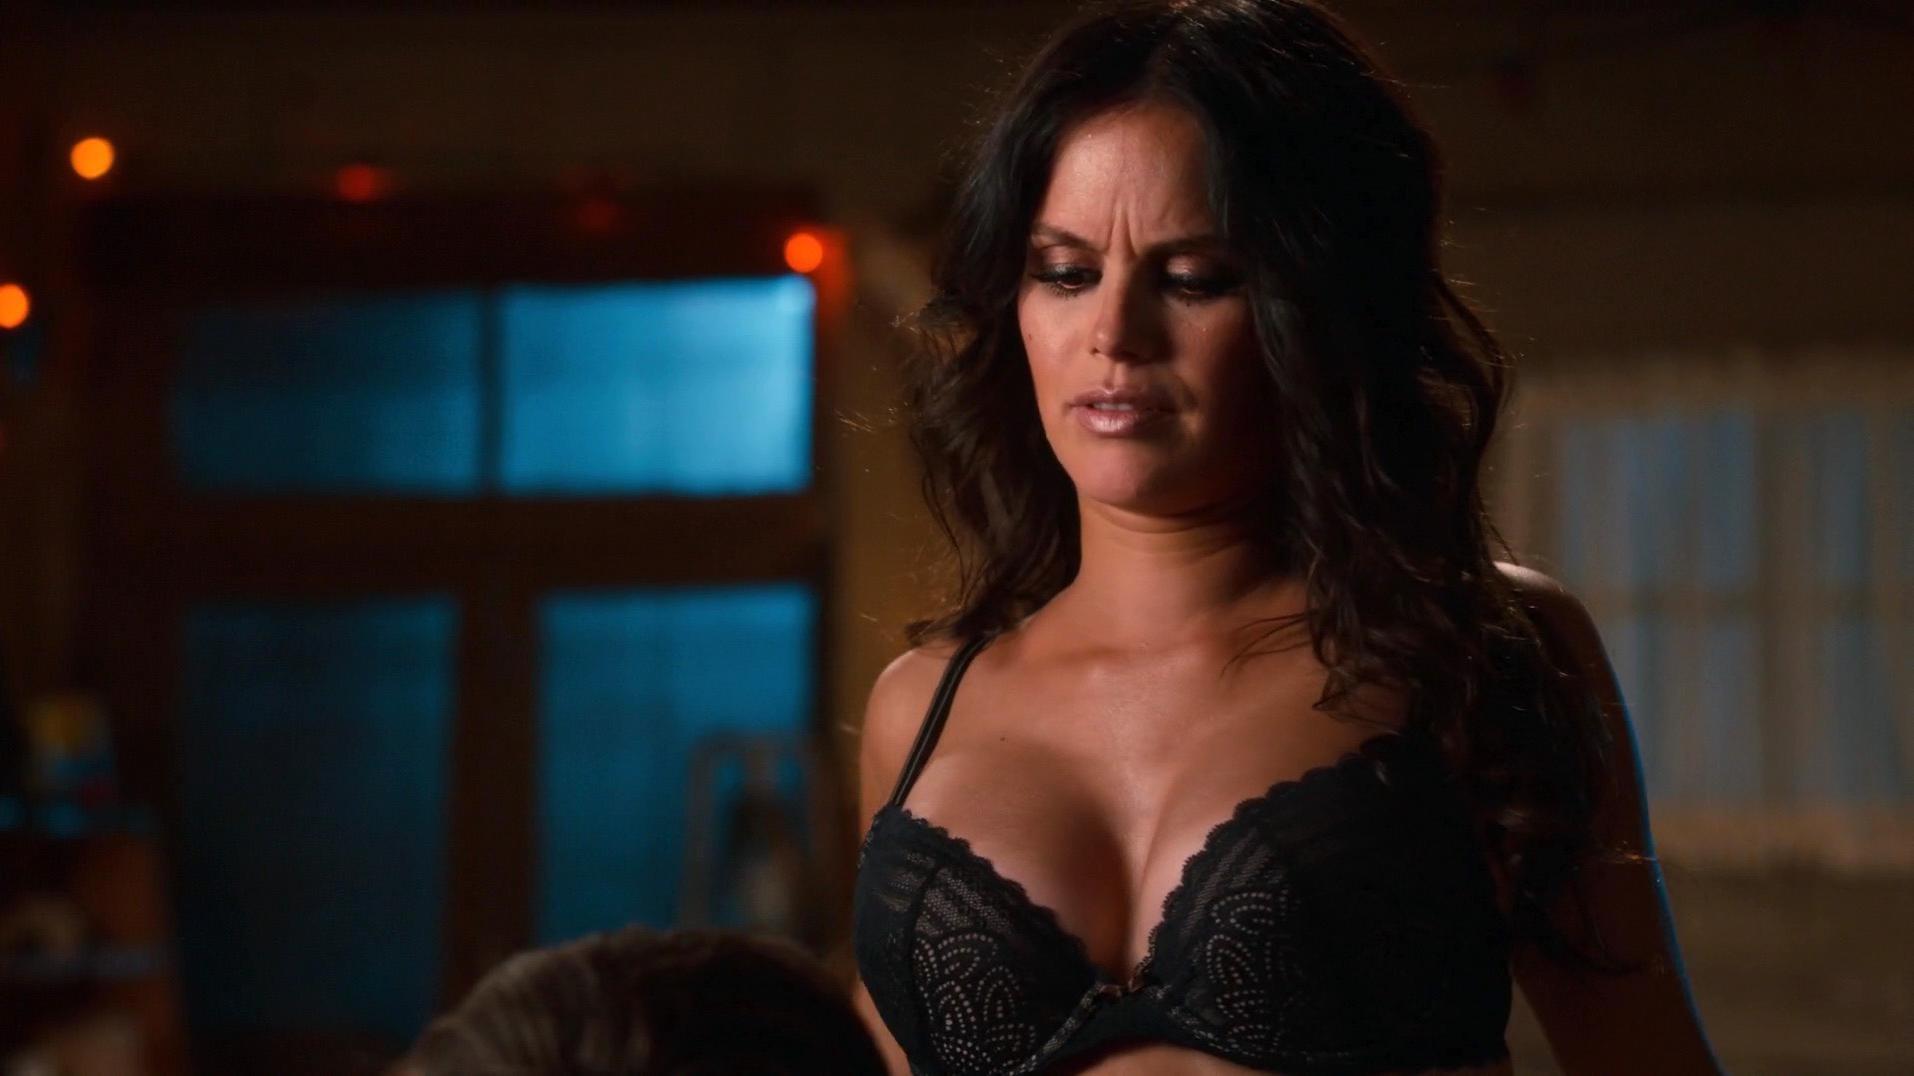 Rachel Bilson sexy - Hart of Dixie s04e01 (2014)